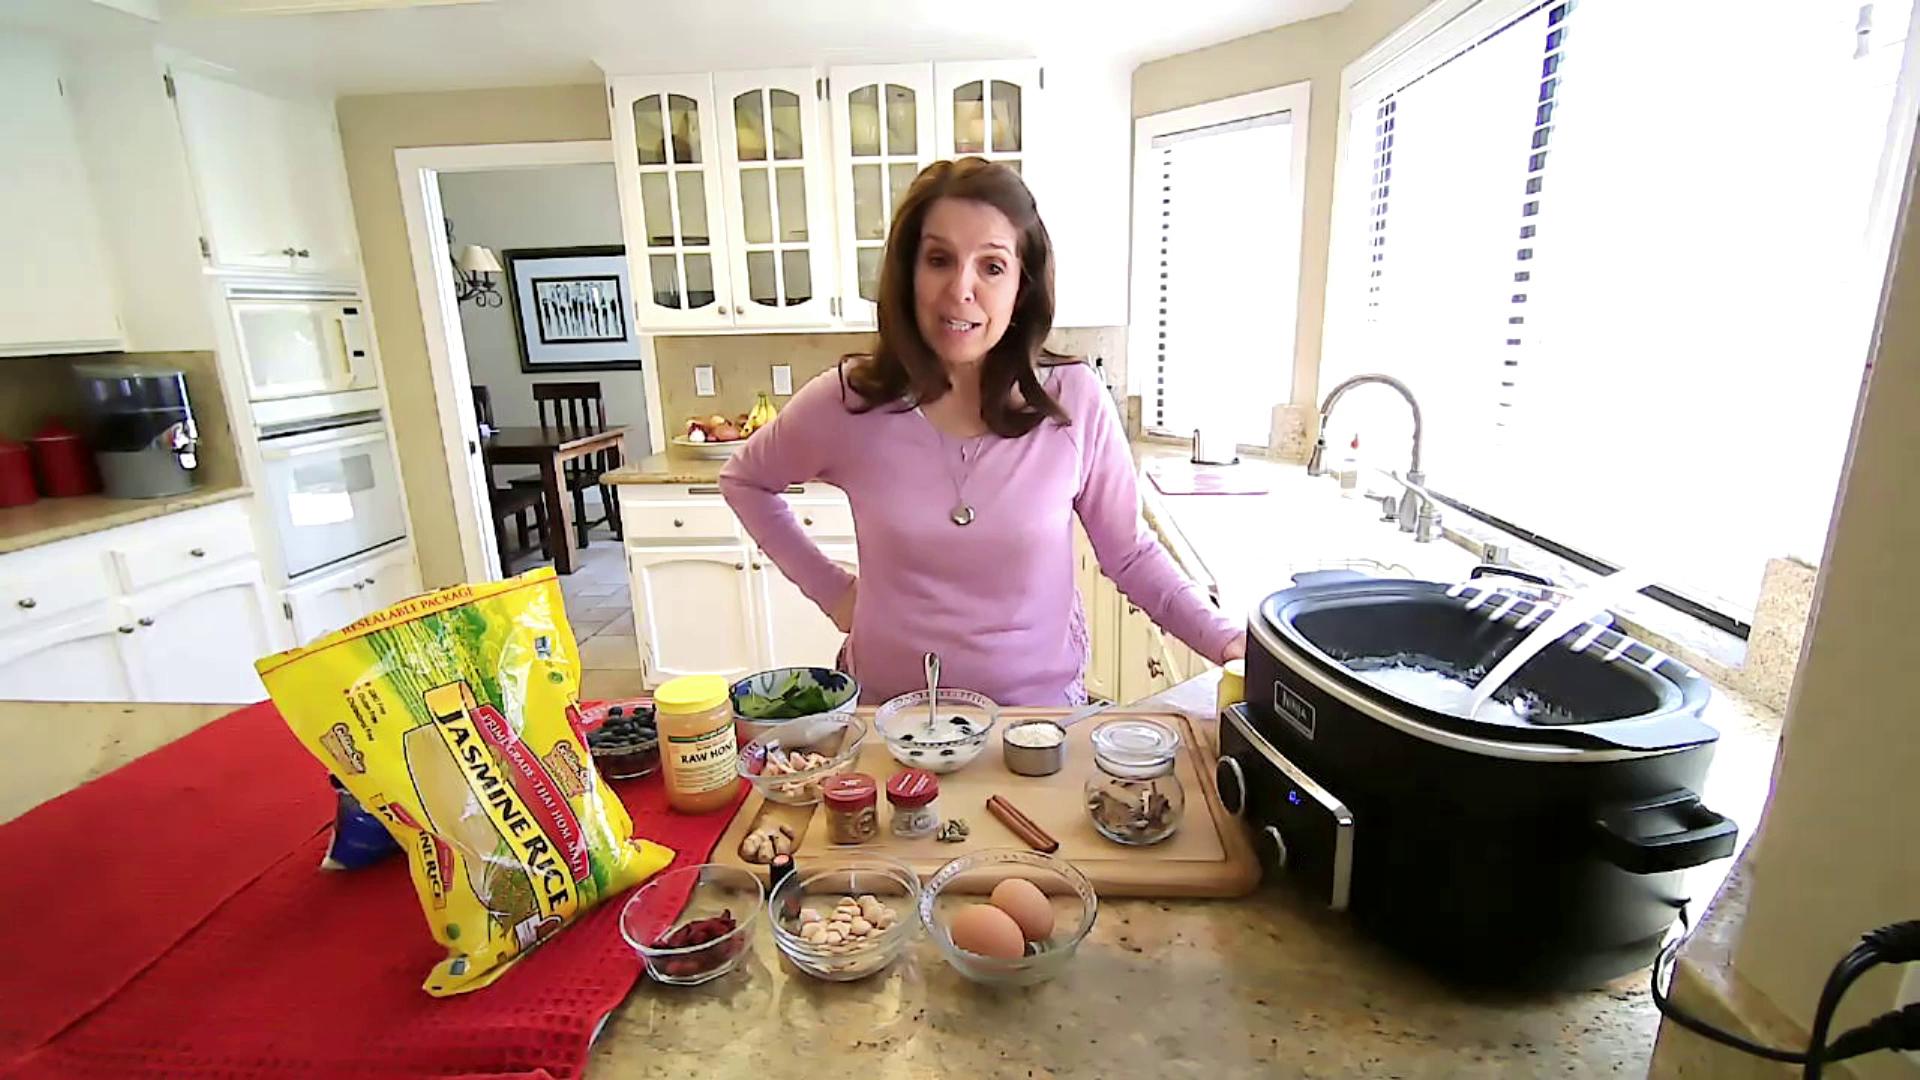 intestines on cutting board with healthy food